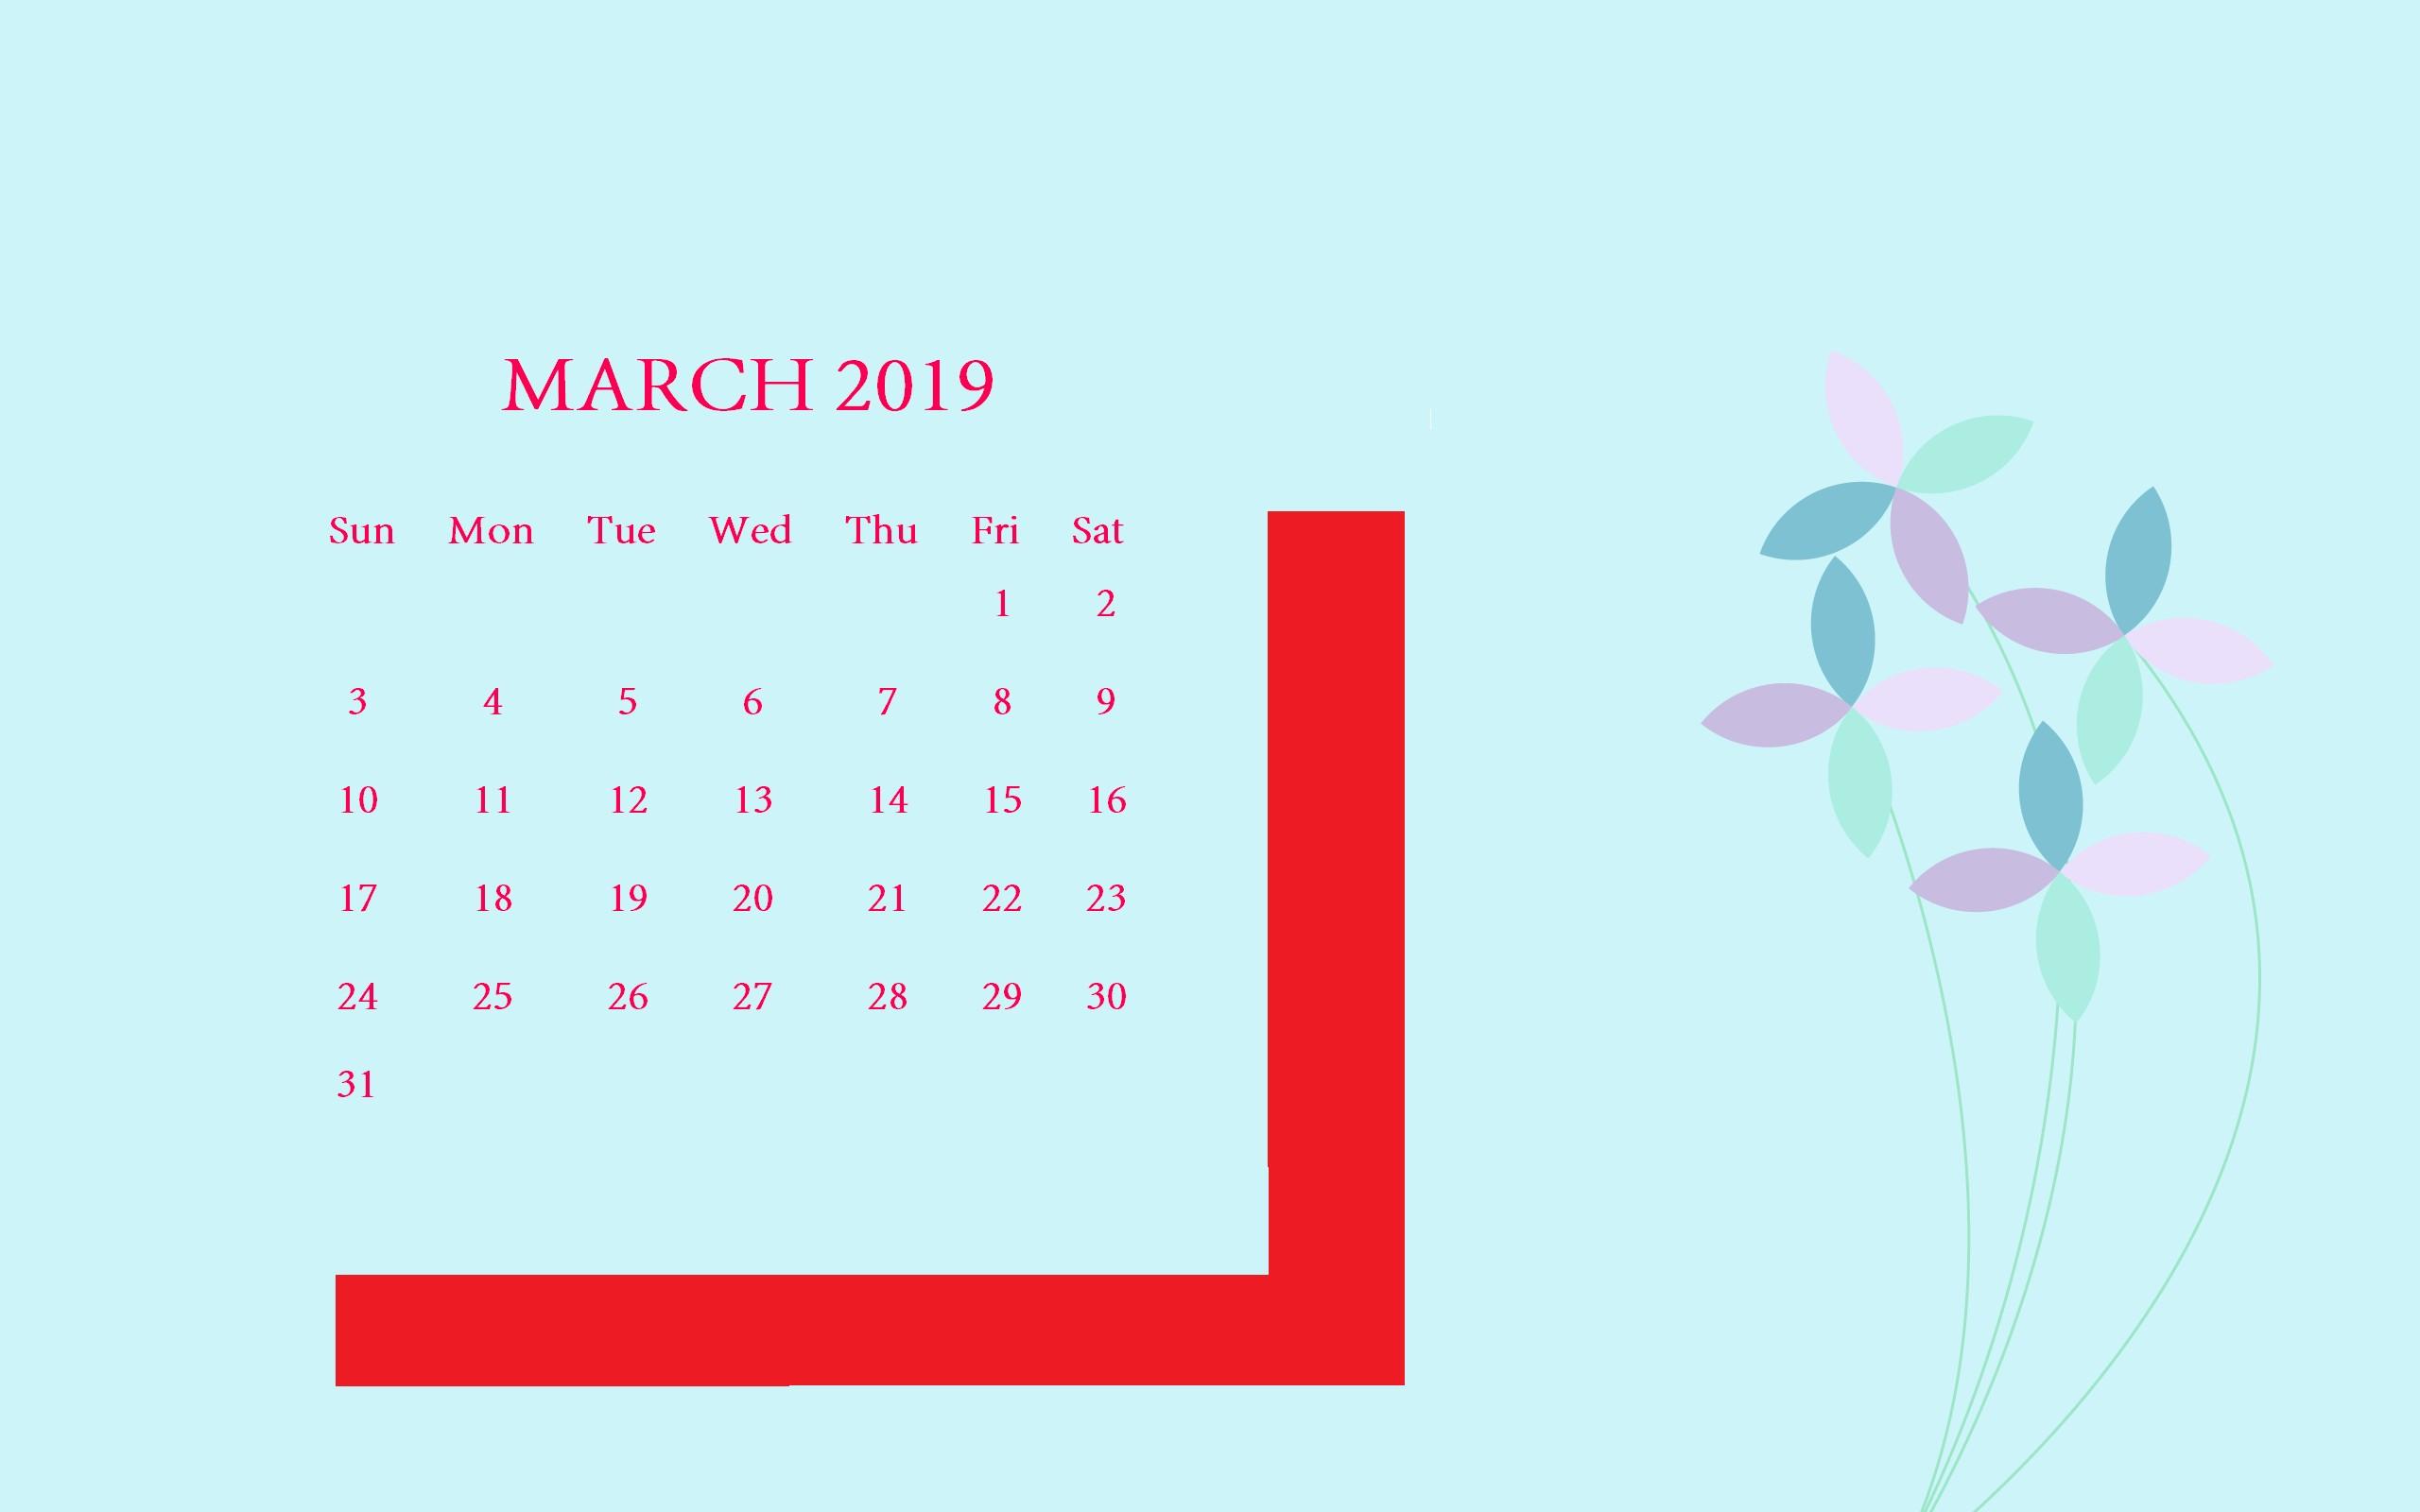 Flowers March 2019 Desktop Calendar march march2019 march2019desktopcalendar